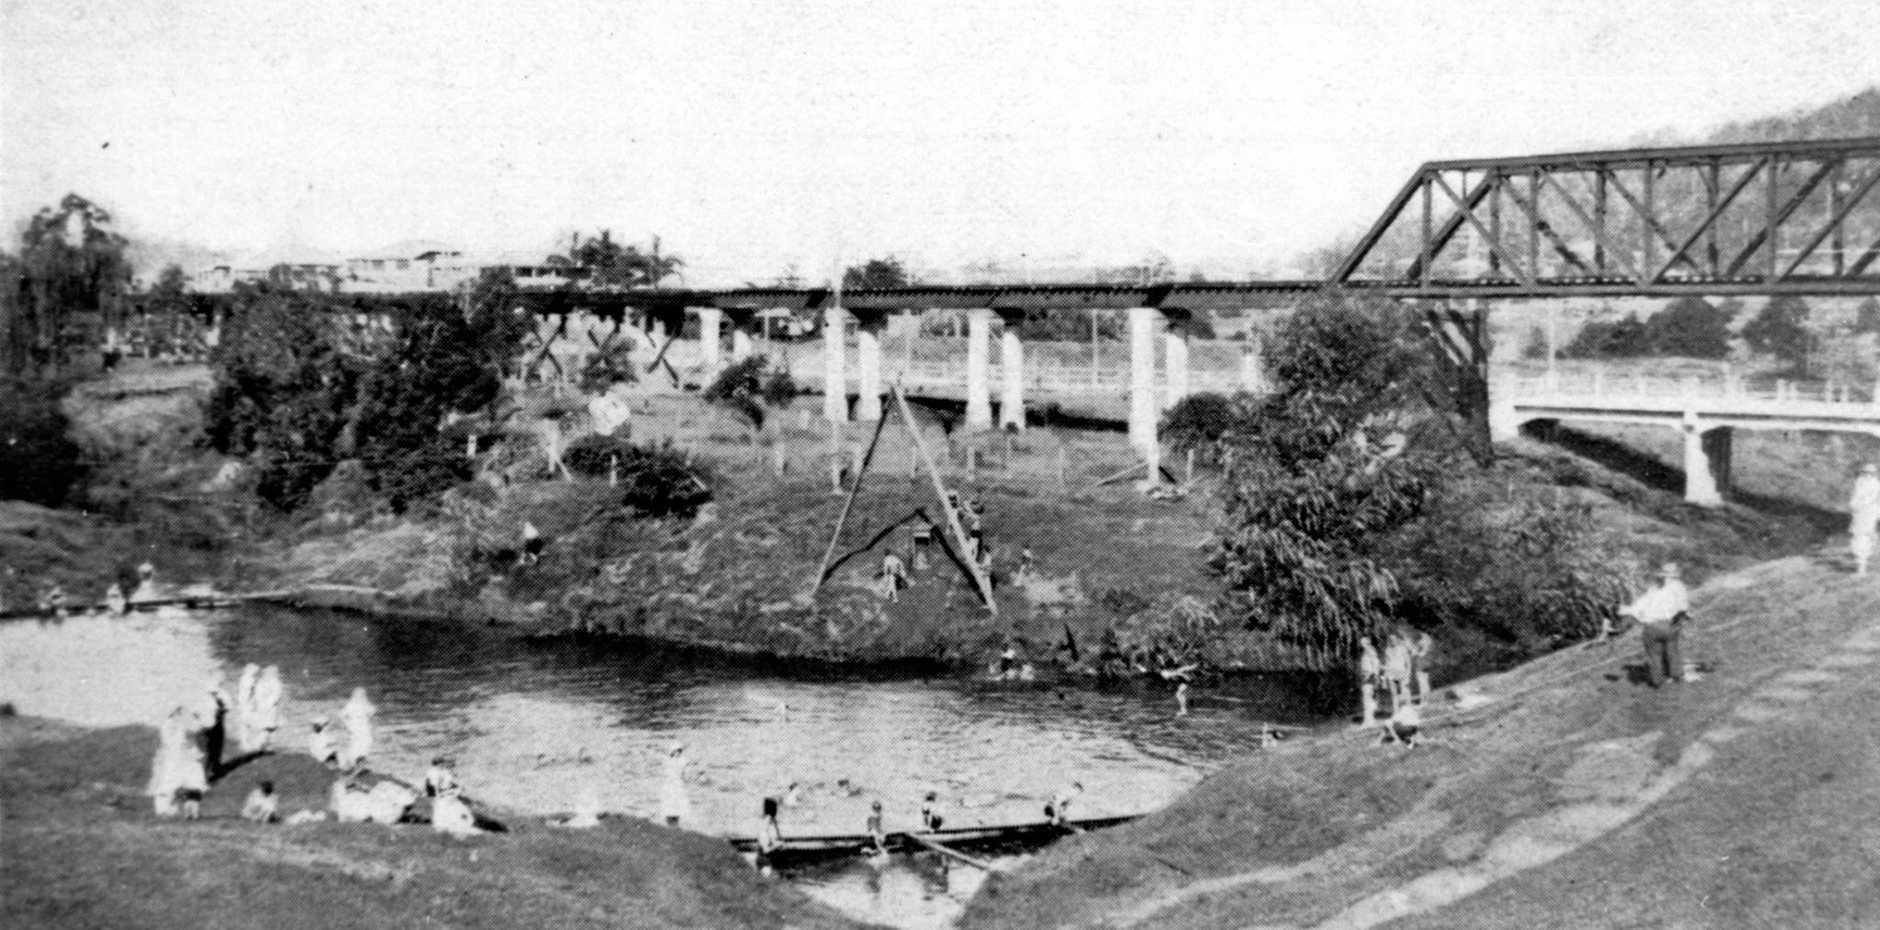 Bathers at Petrie Creek near the railway bridge in 1932.